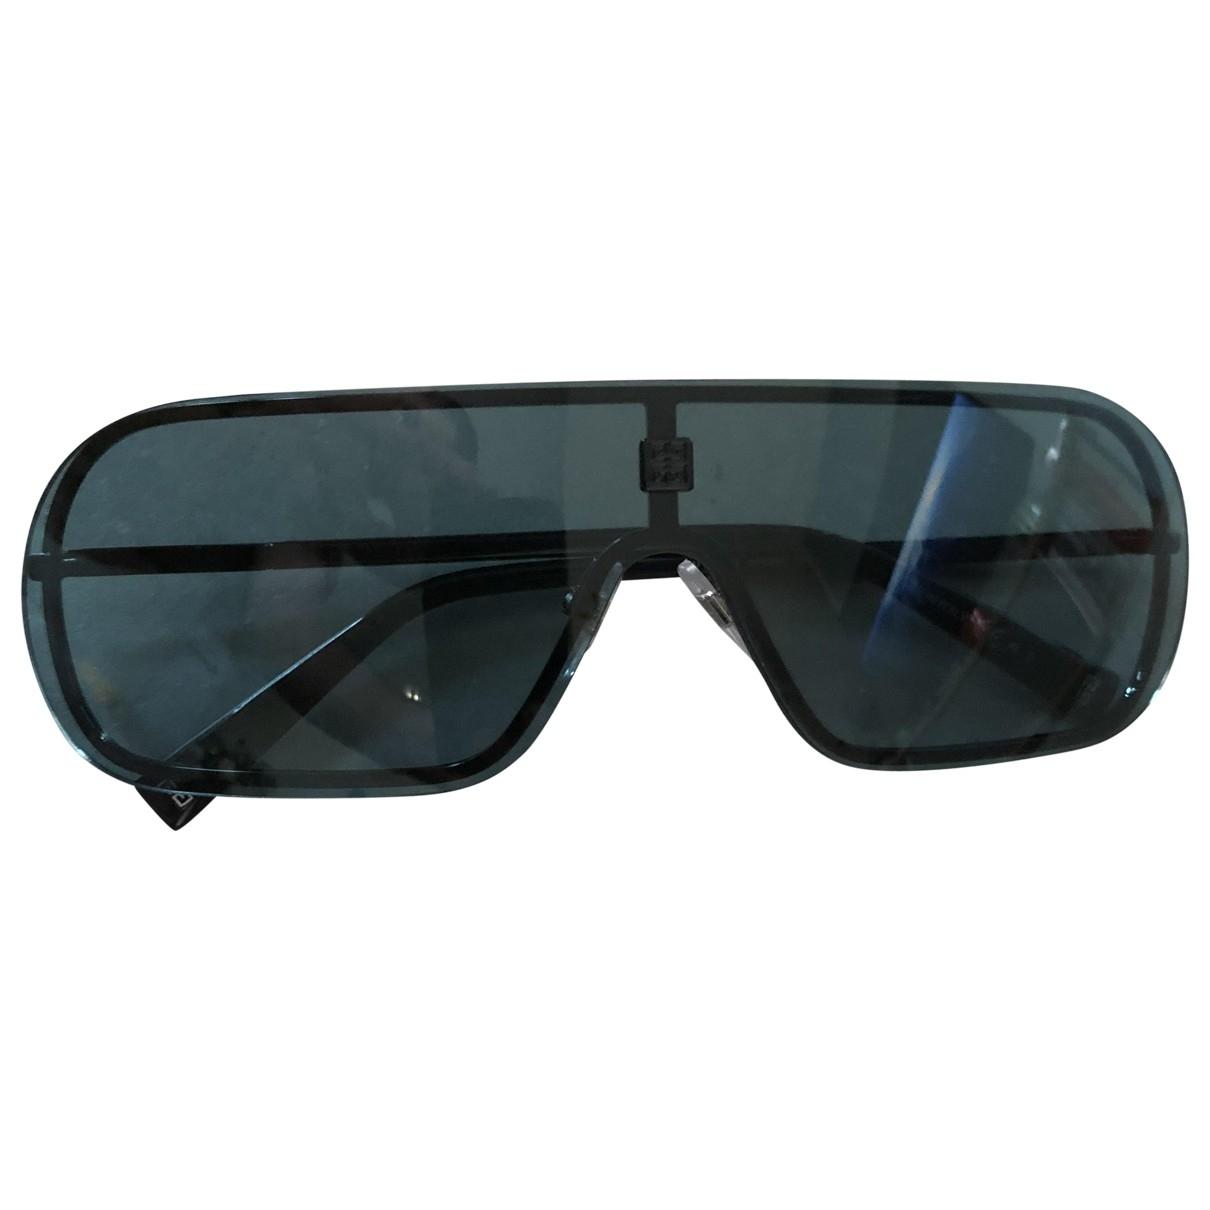 Givenchy \N Blue Metal Sunglasses for Men \N